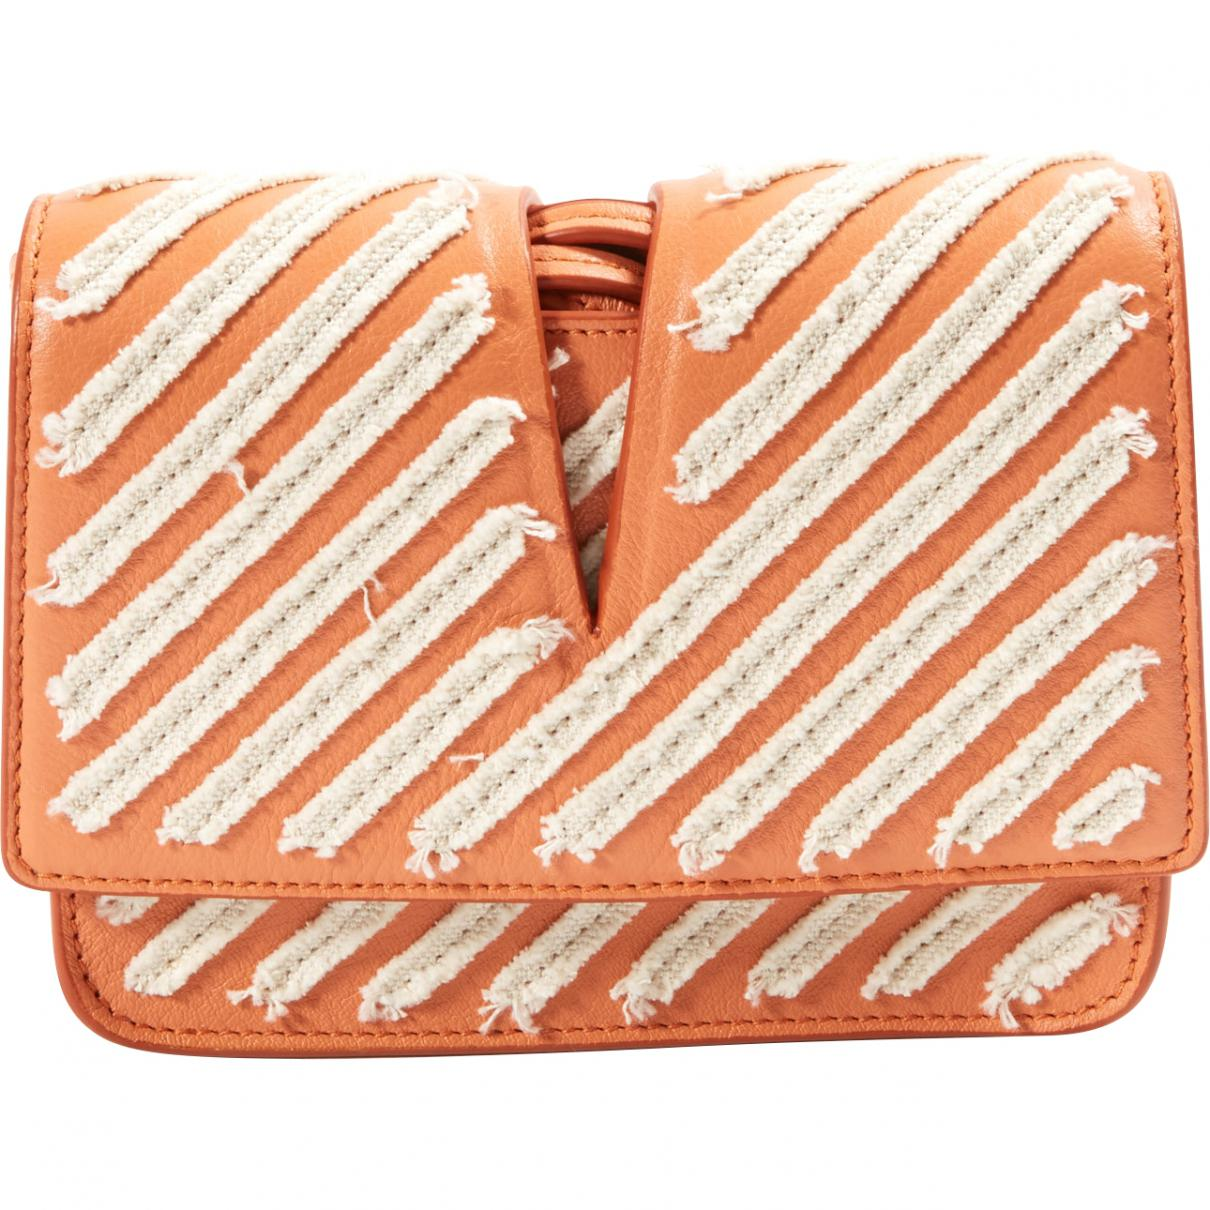 Jil Sander Pre-owned - Leather clutch bag UenKP4U7JX